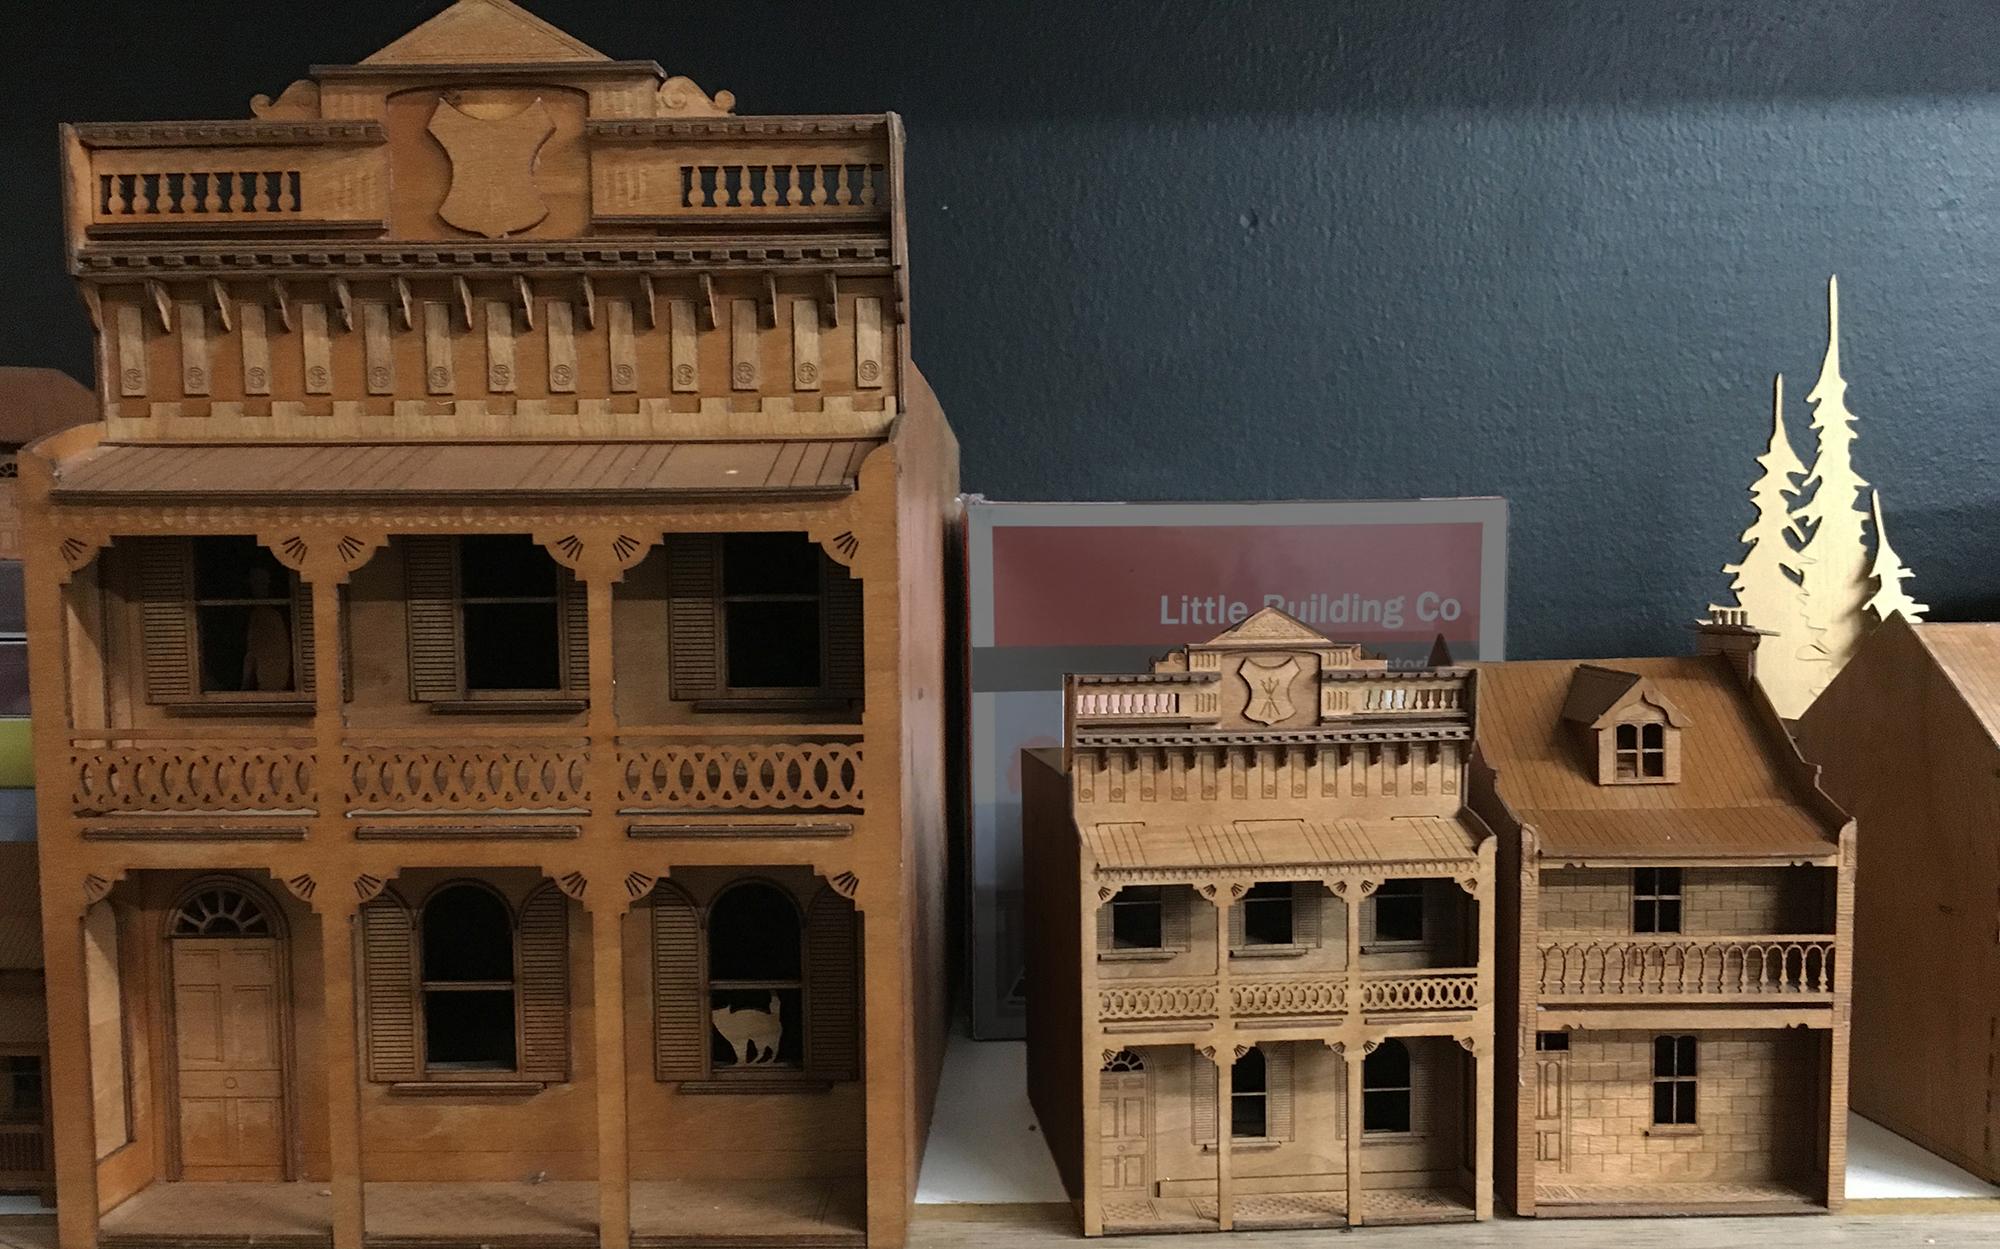 Little Building Co – Fine architectural model kits